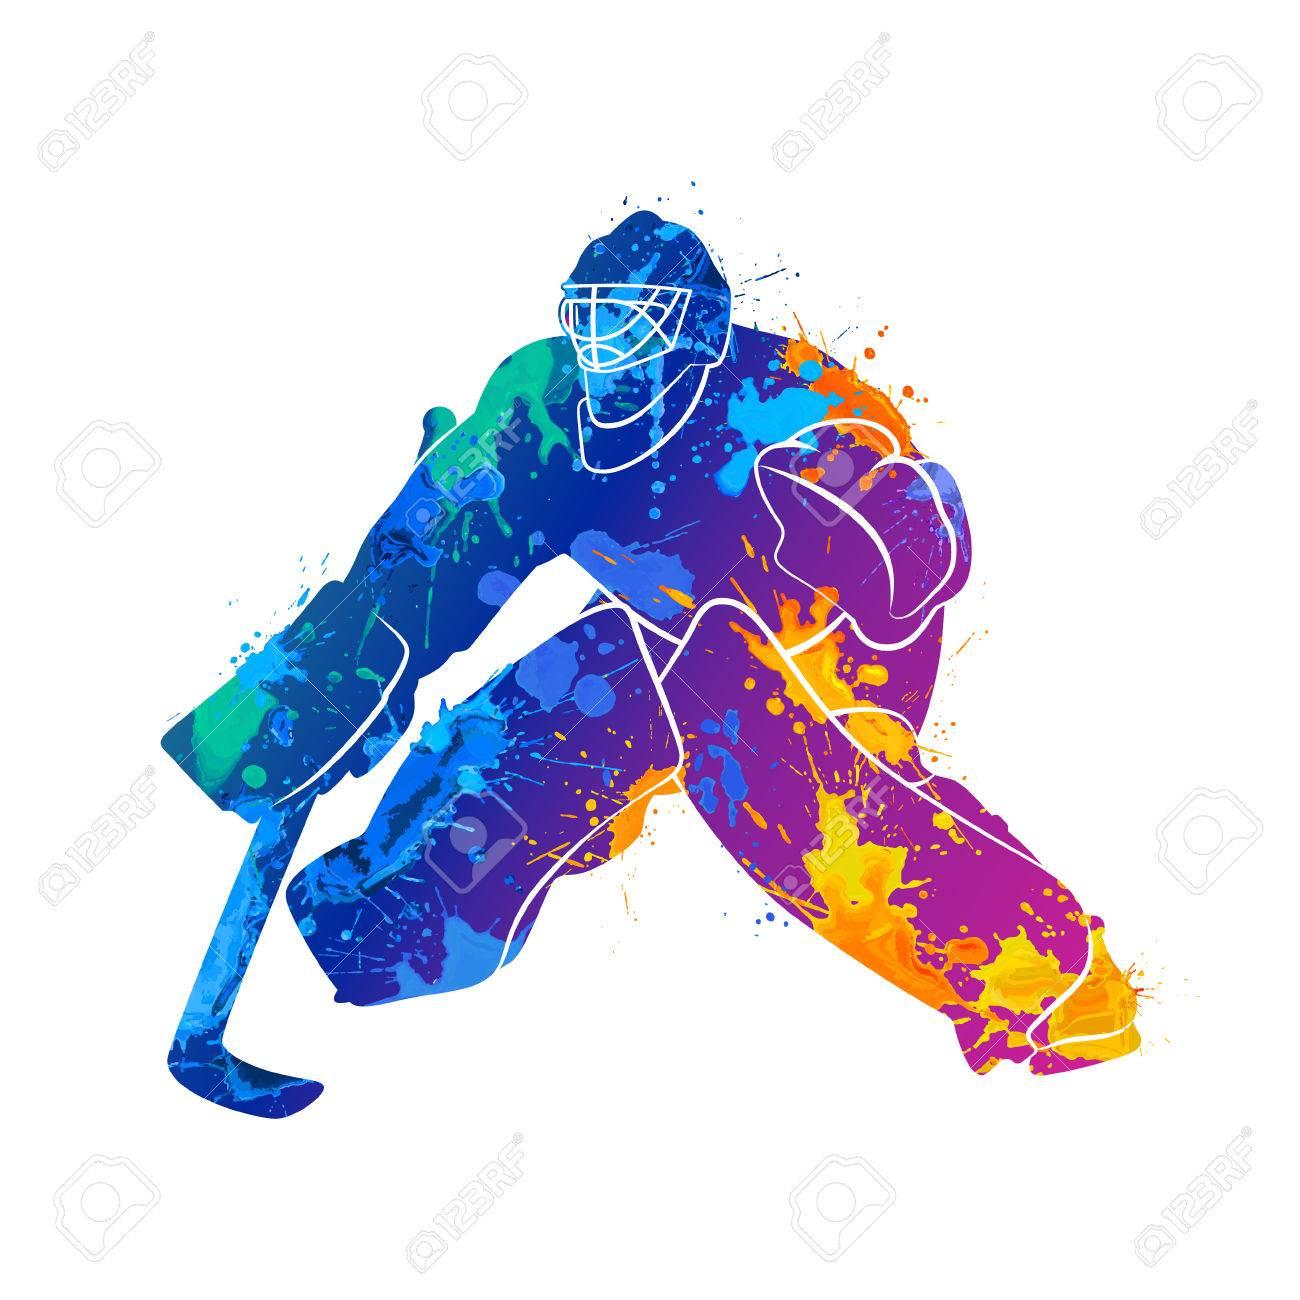 player hockey goalie.